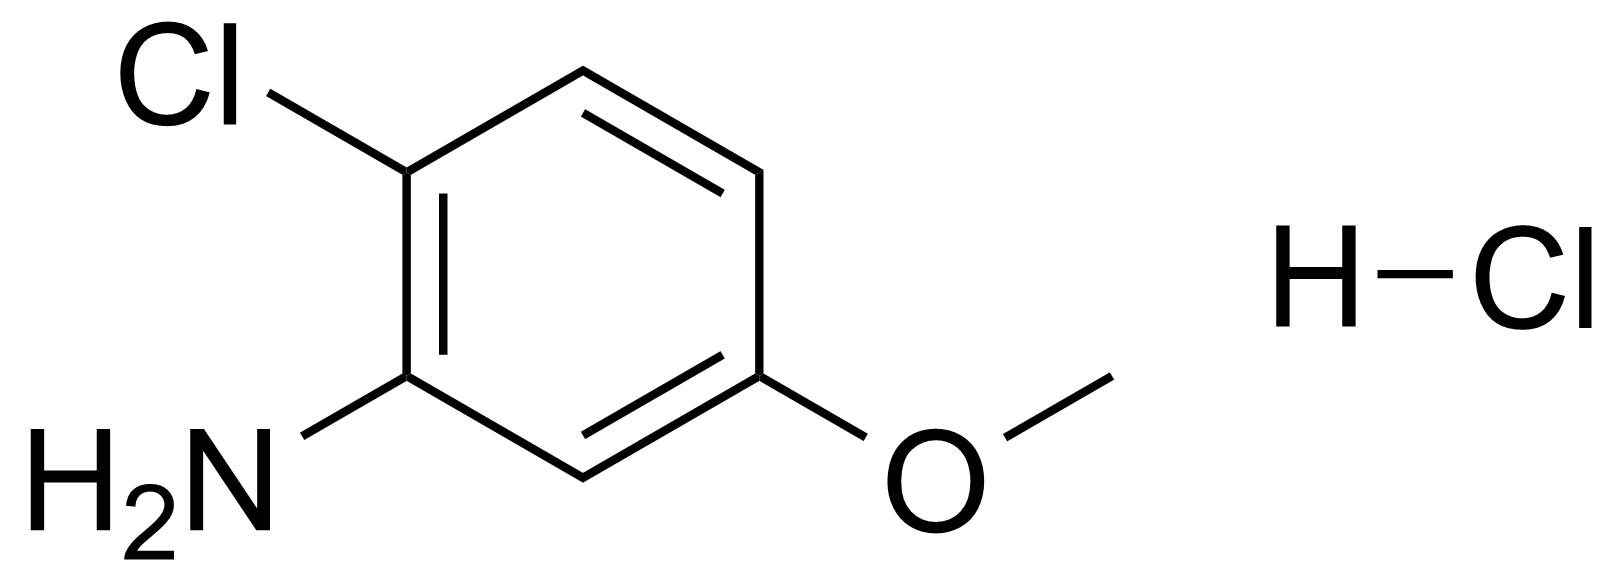 Structure of 6-Chloro-m-anisidine hydrochloride